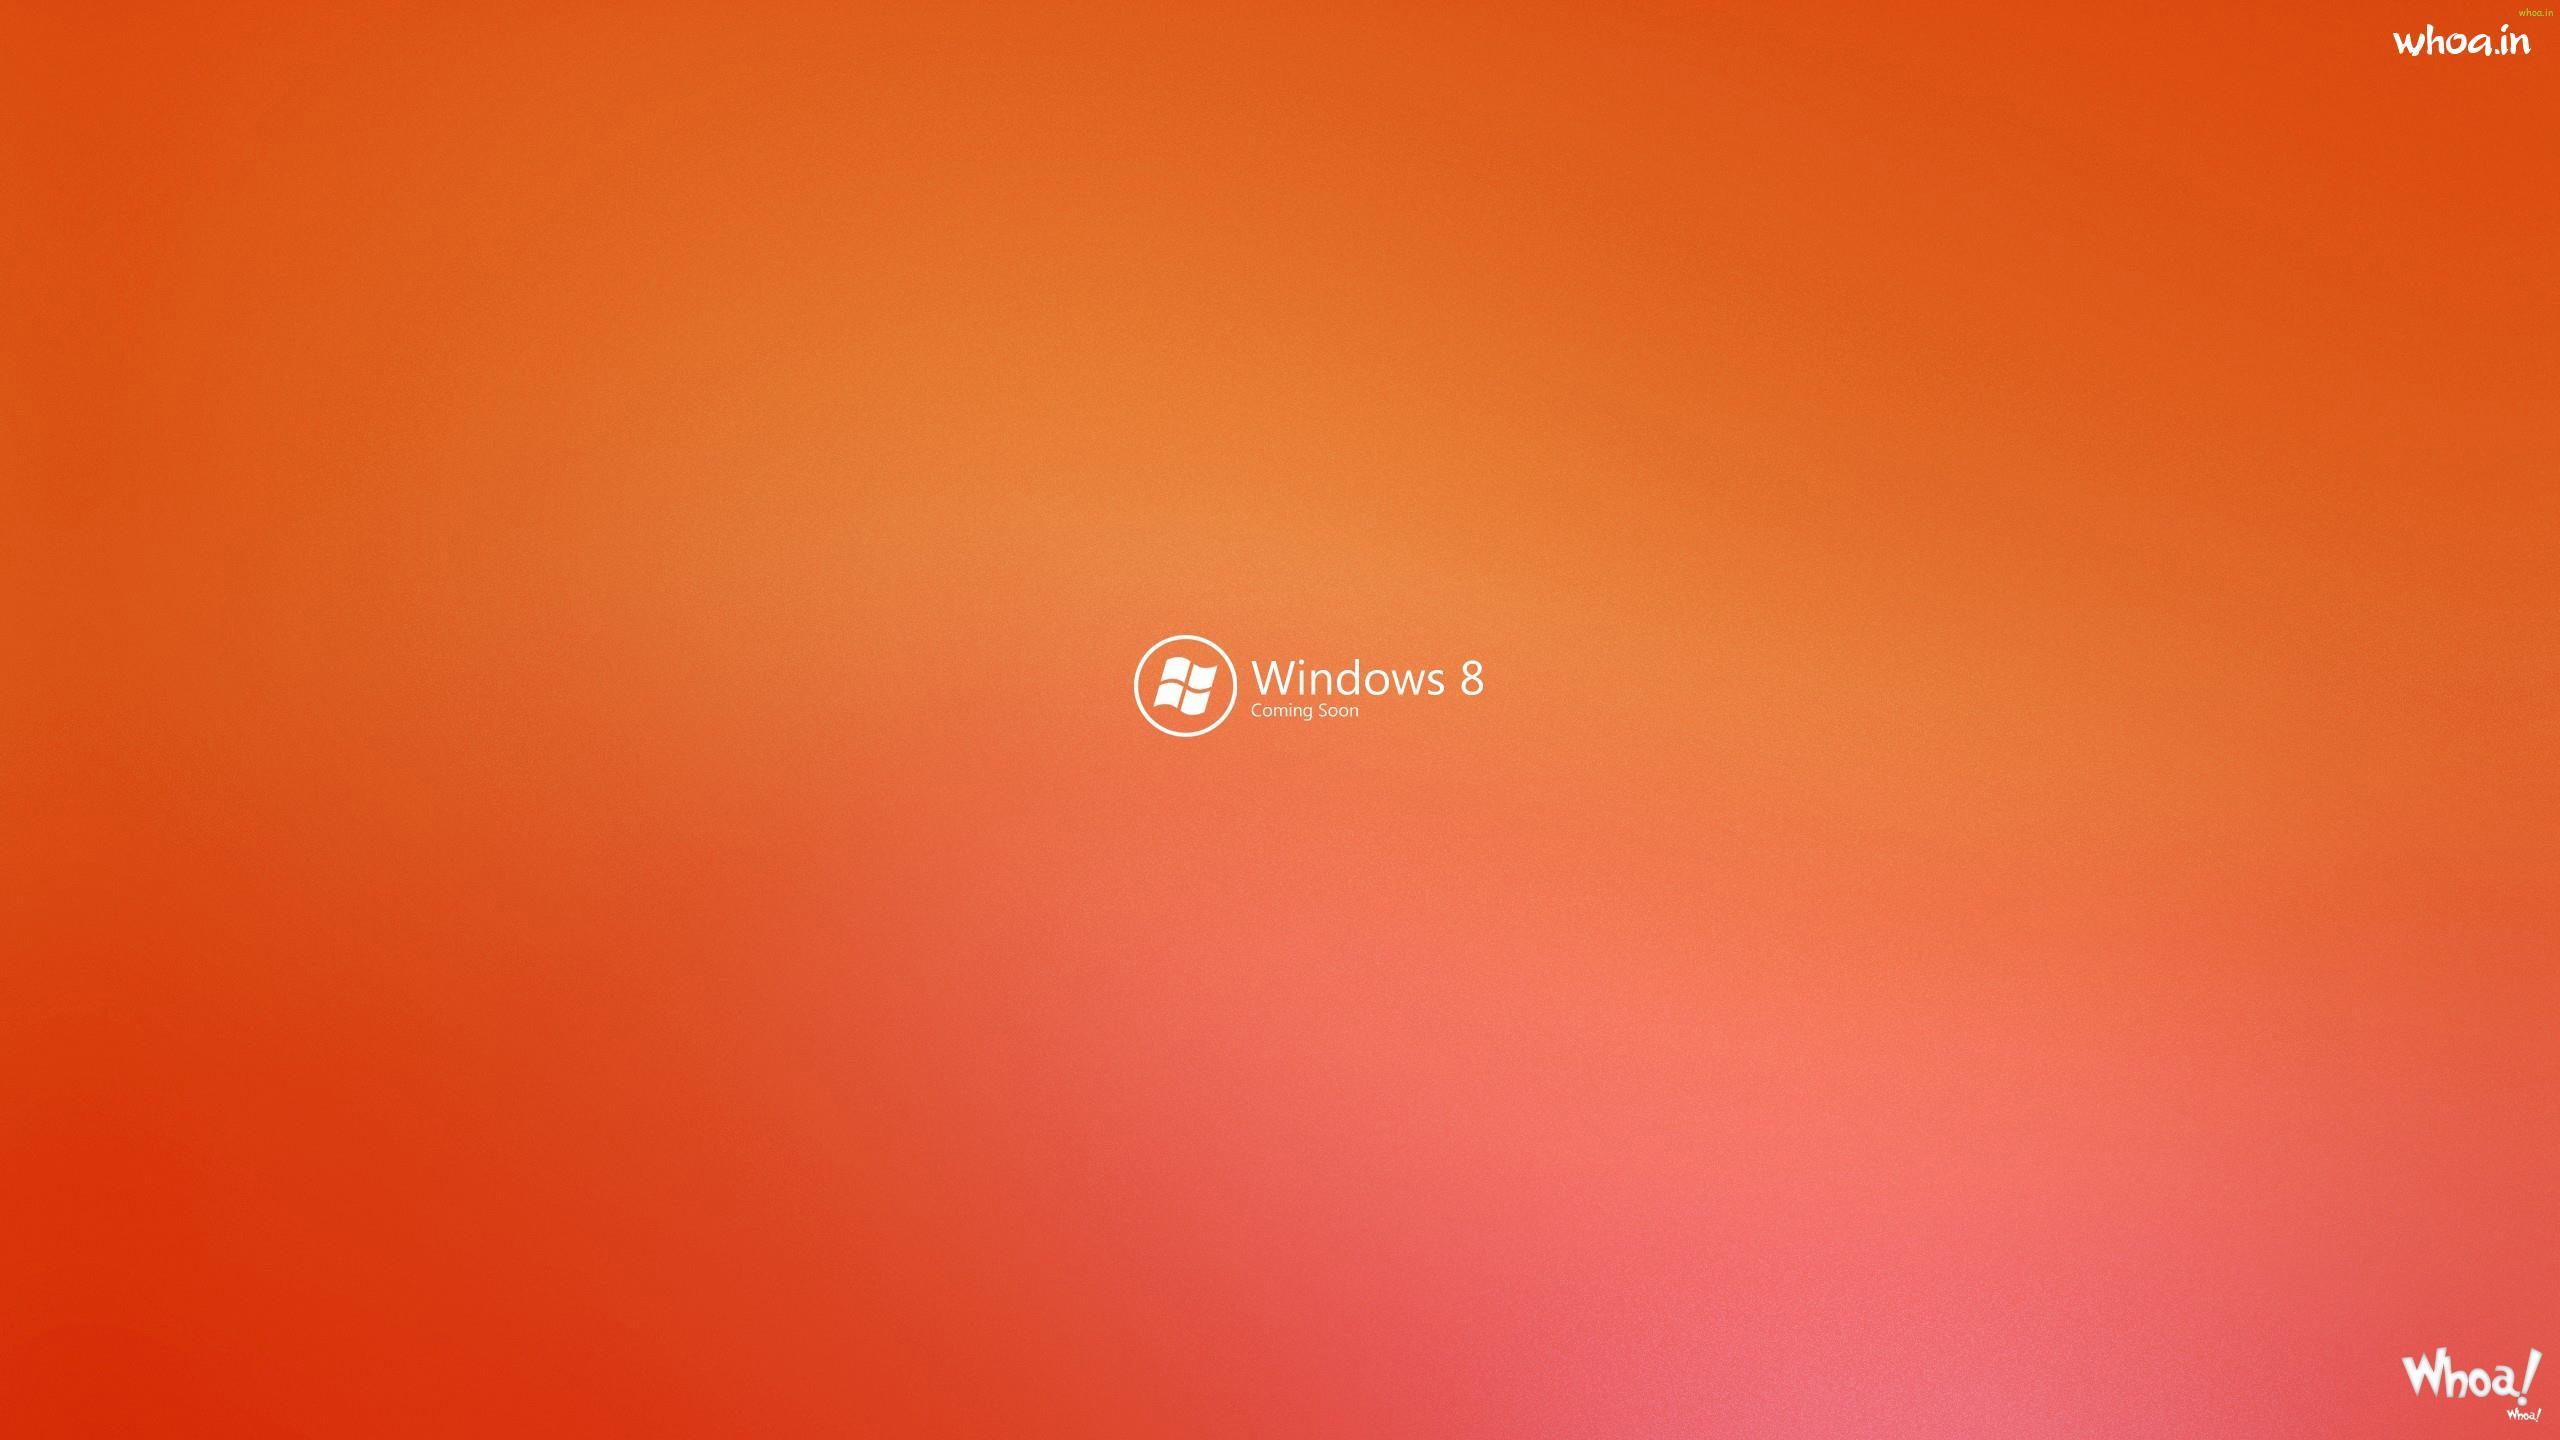 windows 8 orange and pink shading hd wallpaper